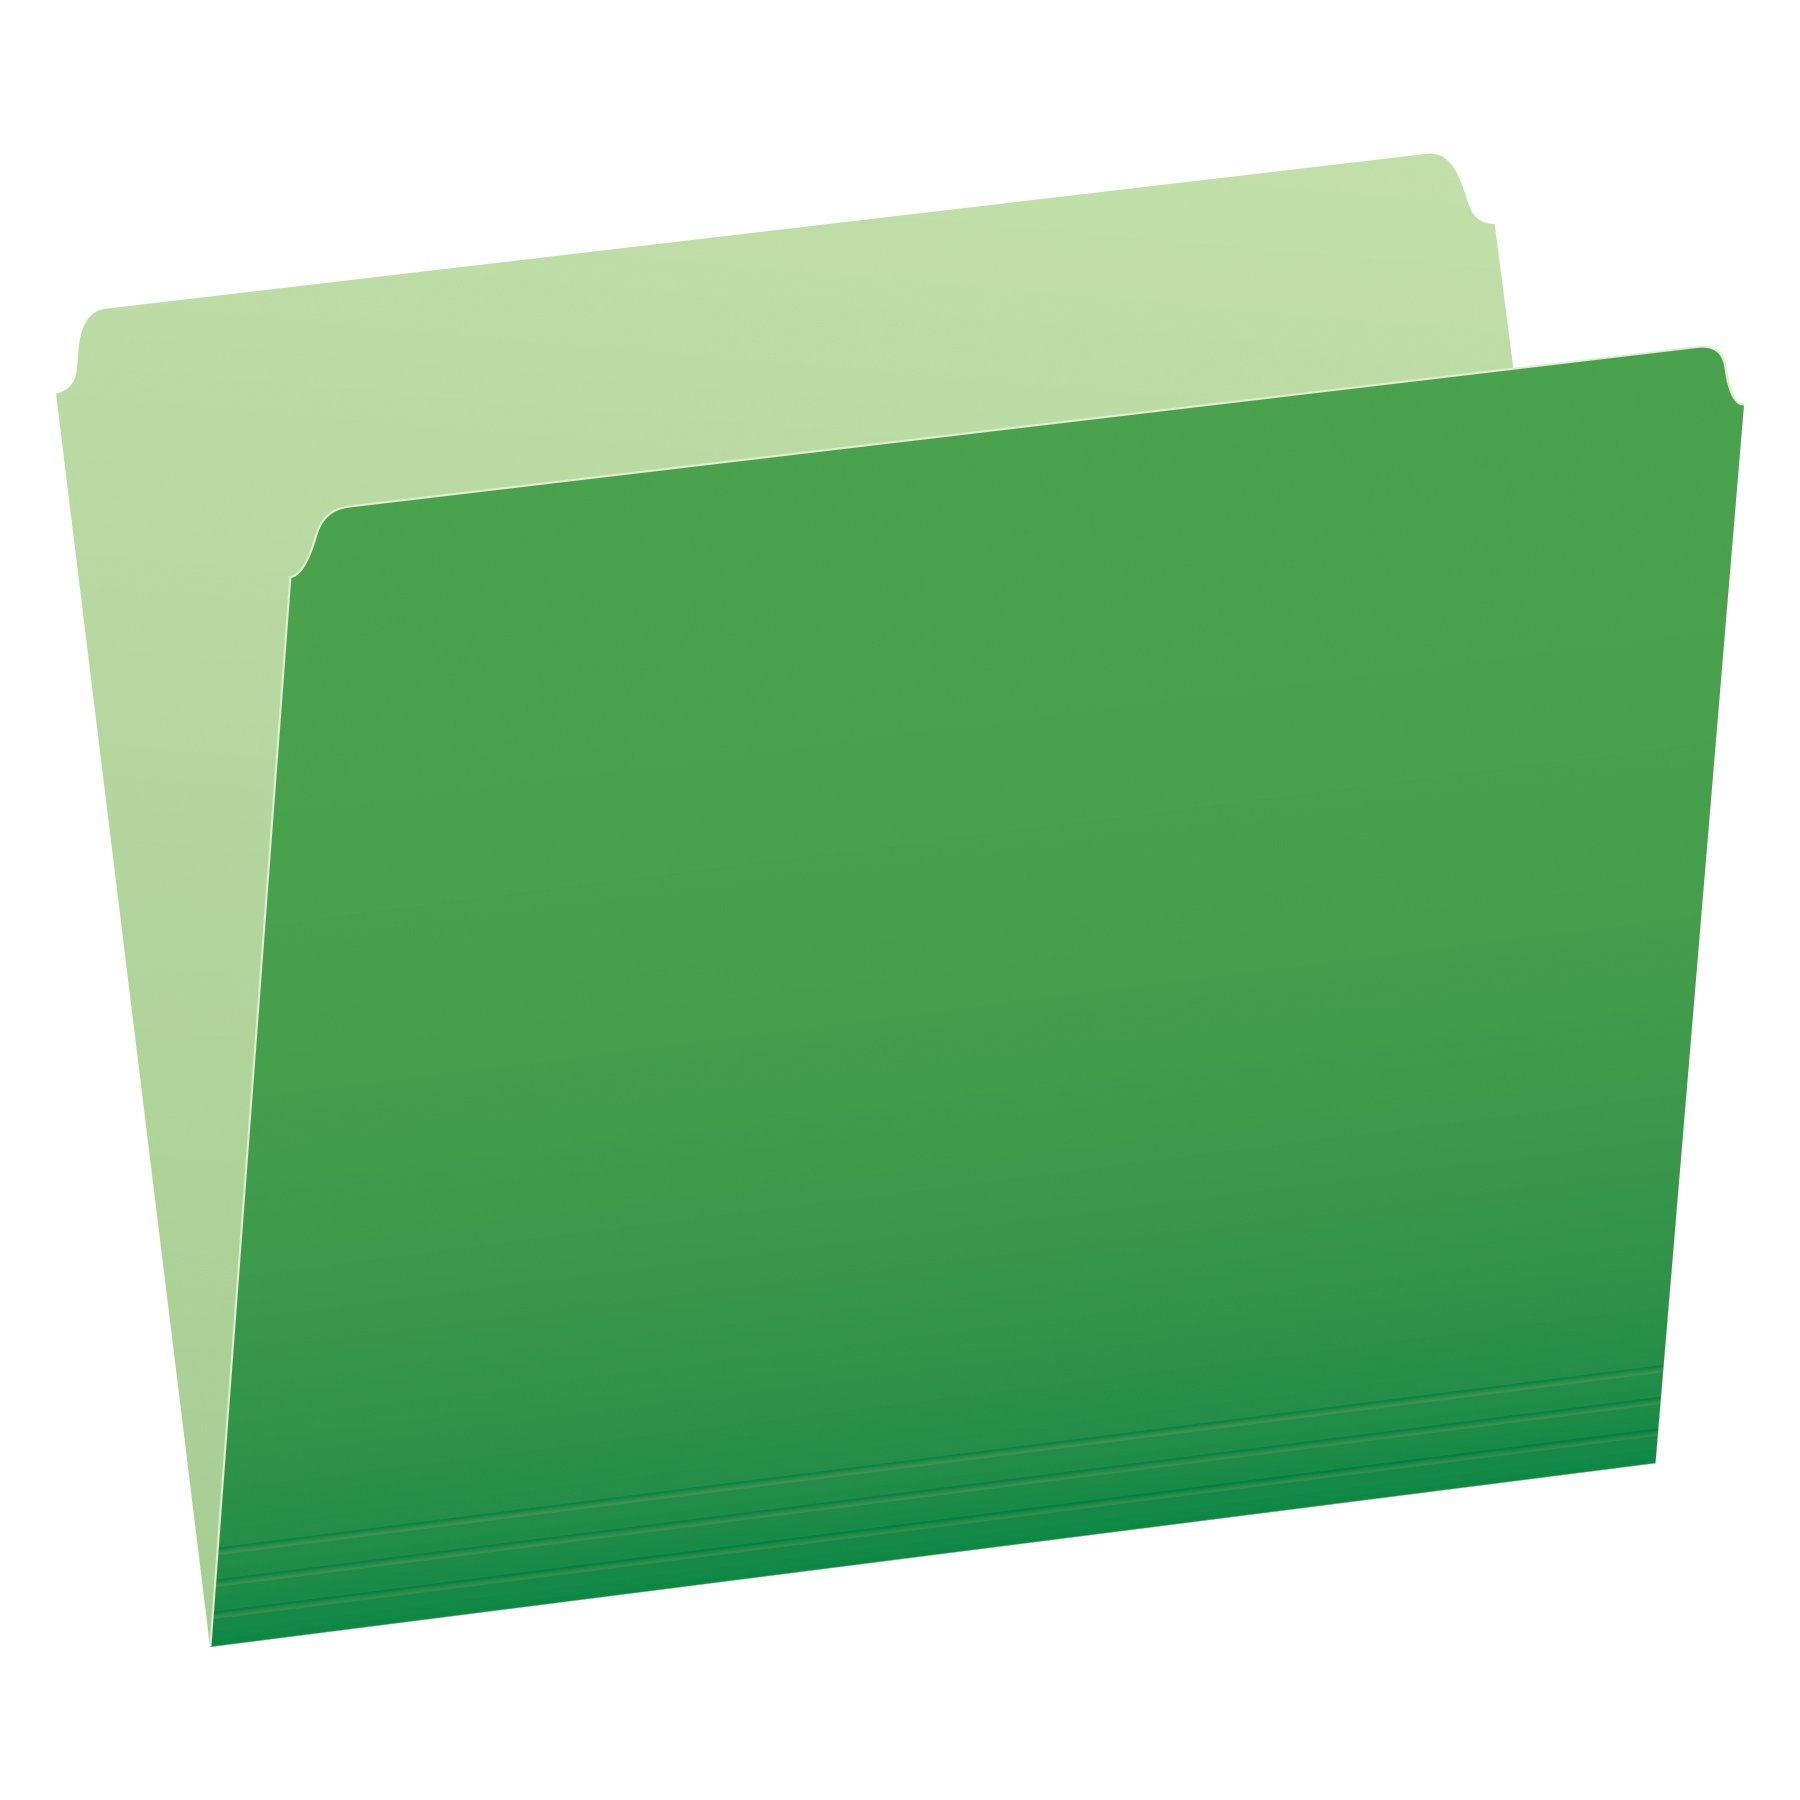 Pendaflex Colored File Folders, Green (PFX152BGR) by Pendaflex